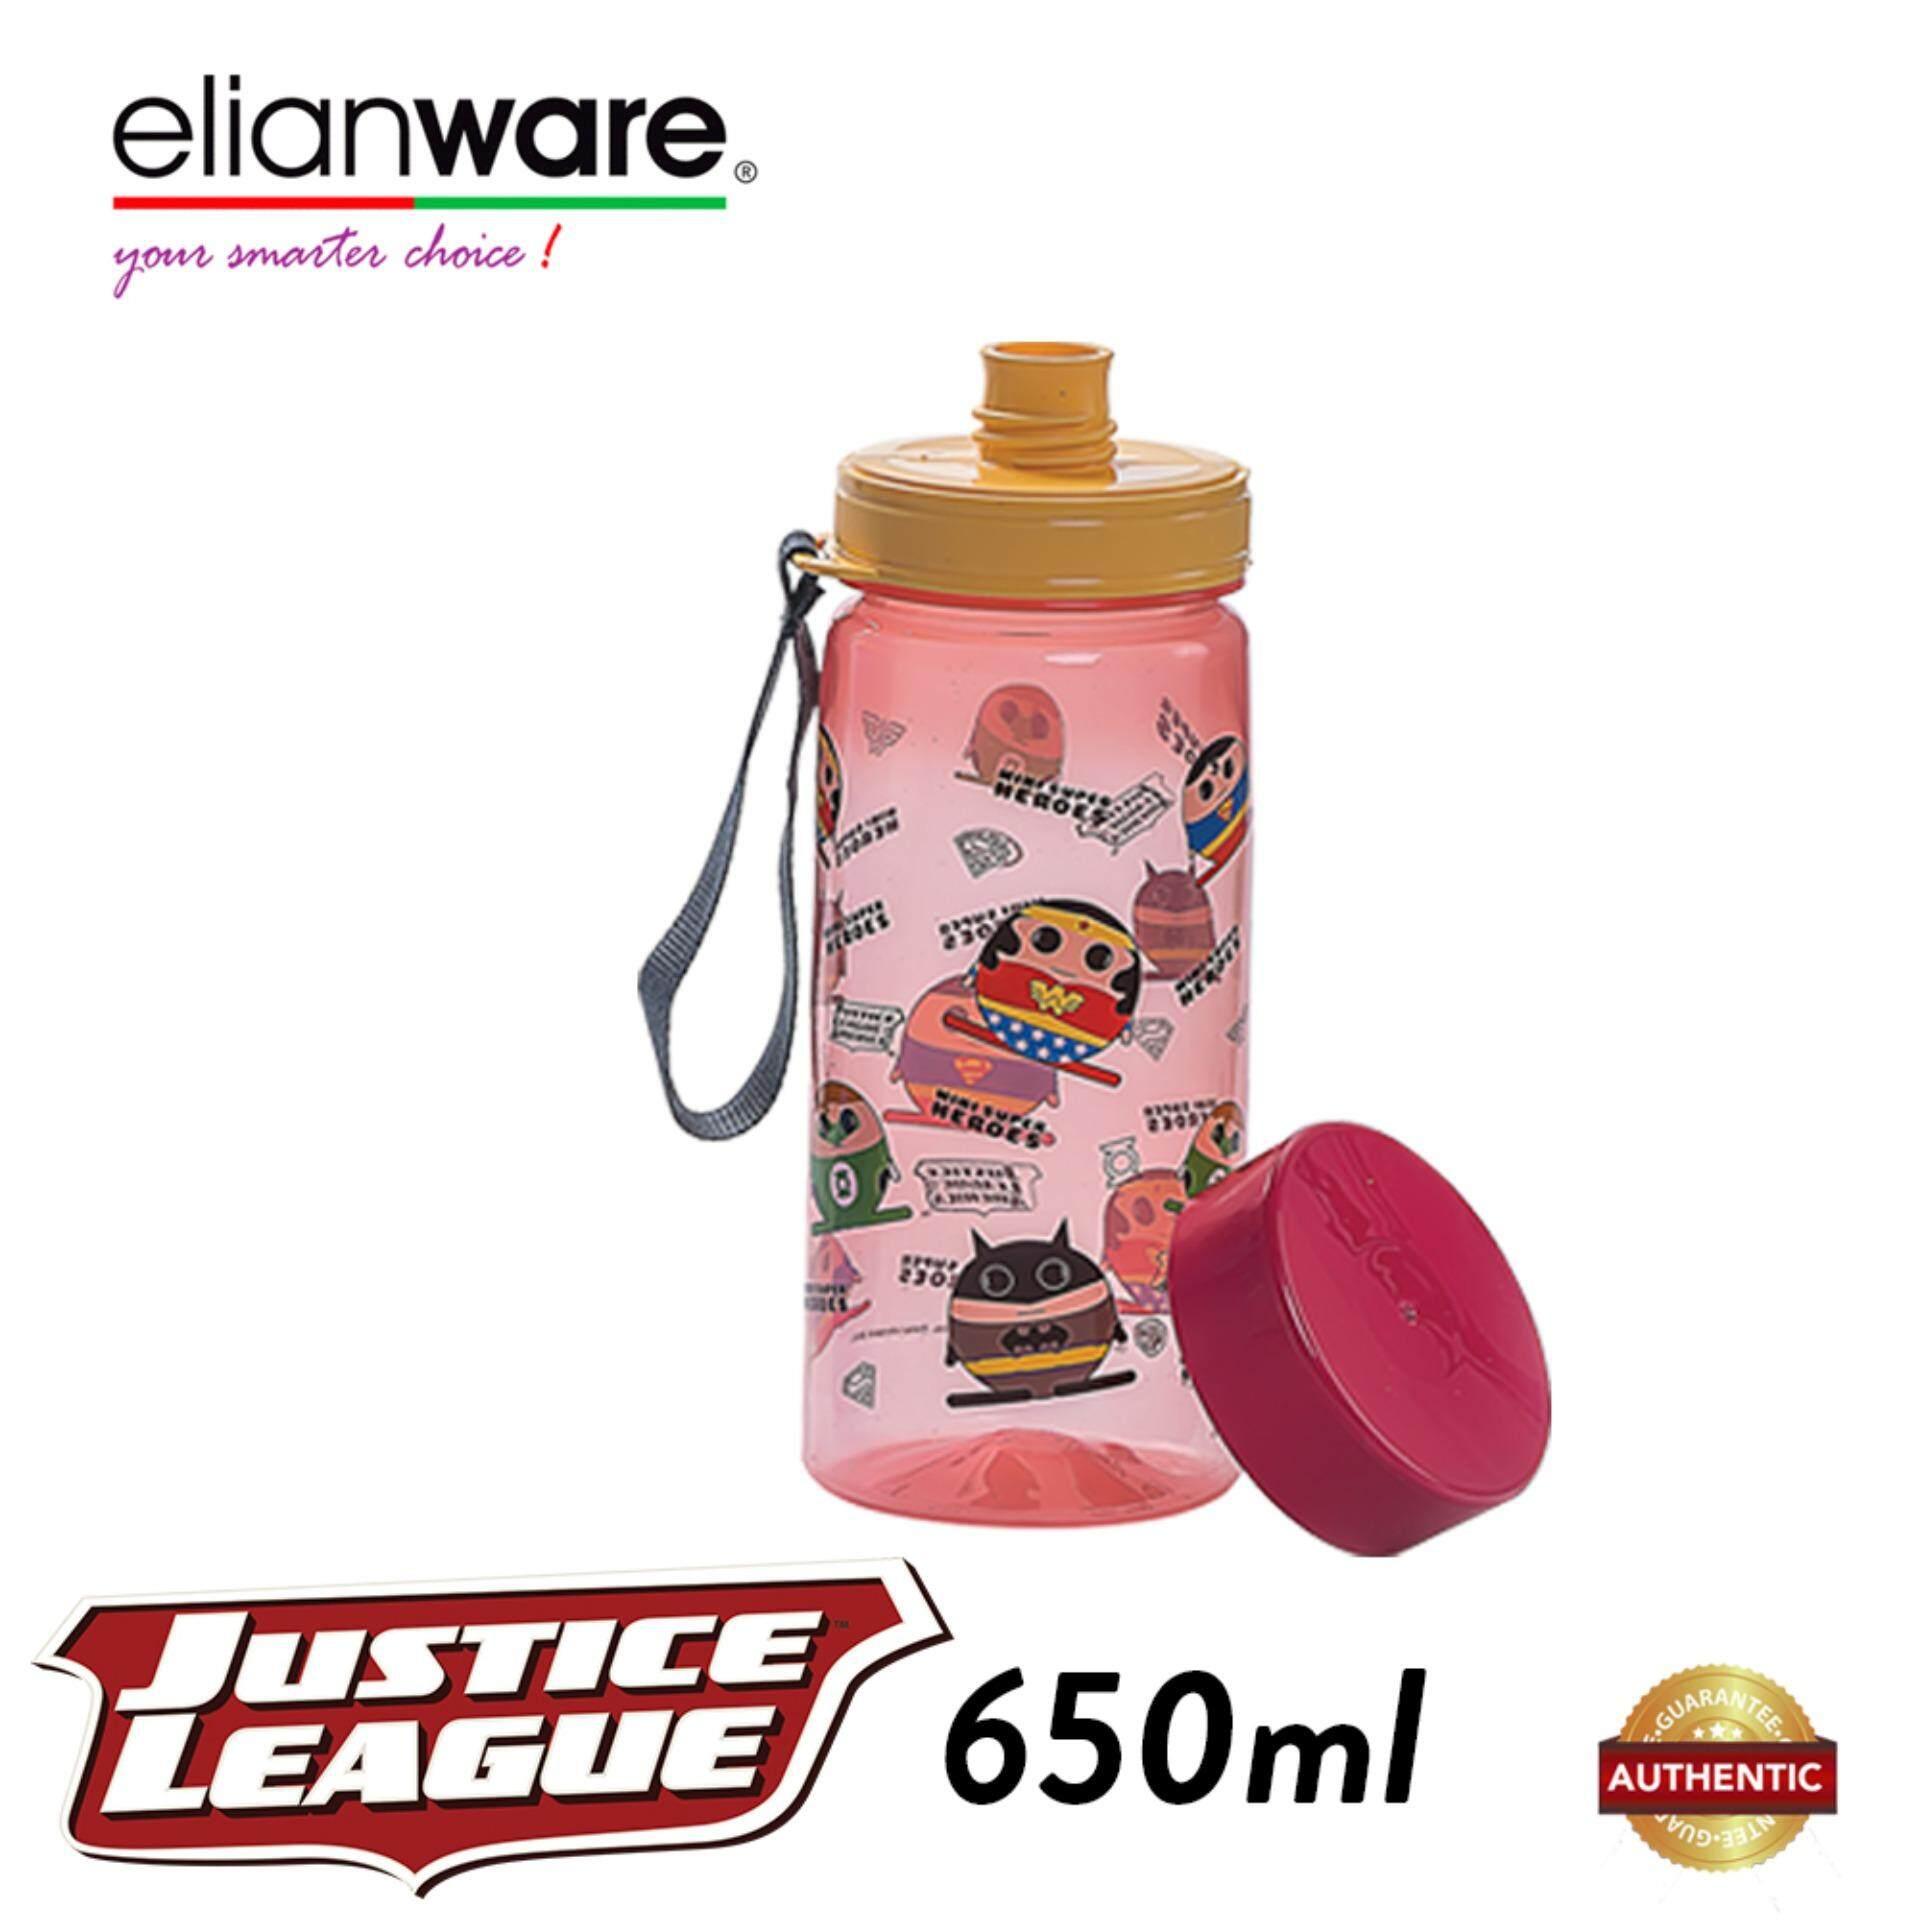 Elianware DC Justice League 650ml BPA Free Mini Super Heroes Water Bottle